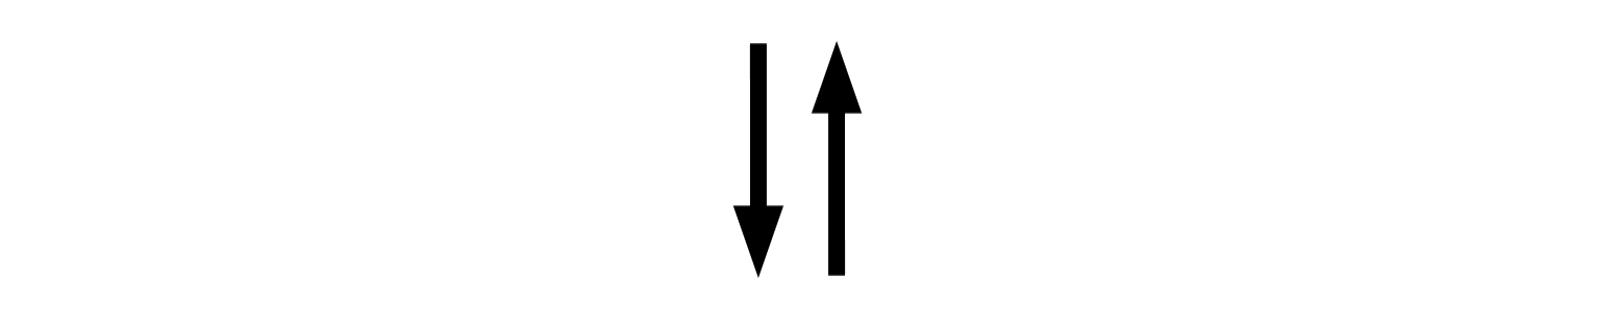 Symbol-Tapeten-gestuerzt_kleben